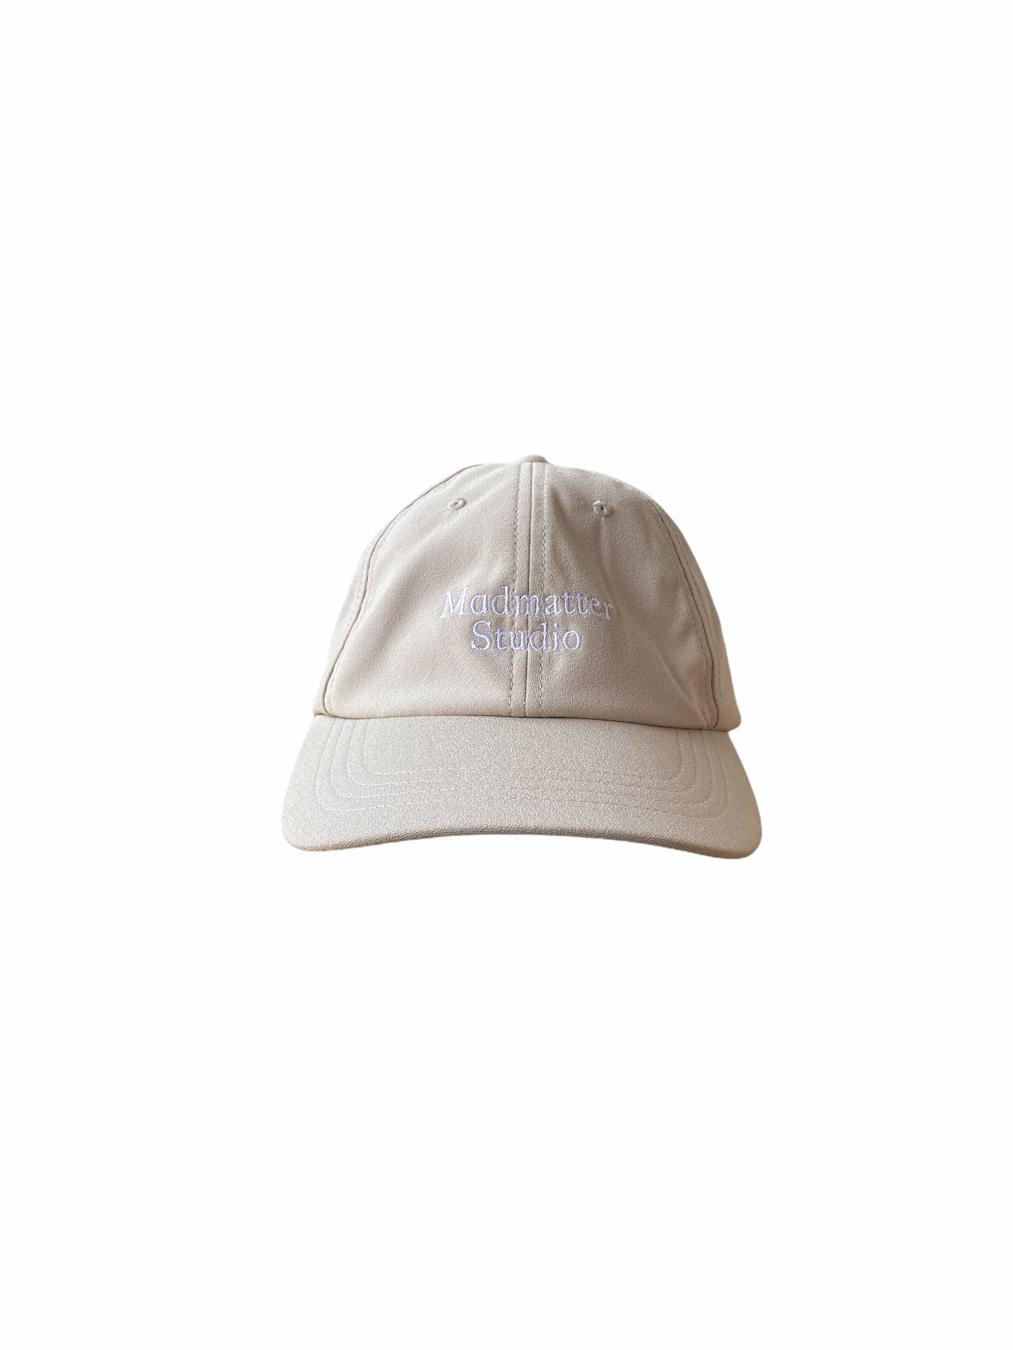 Six Nature Cap  (Beige)